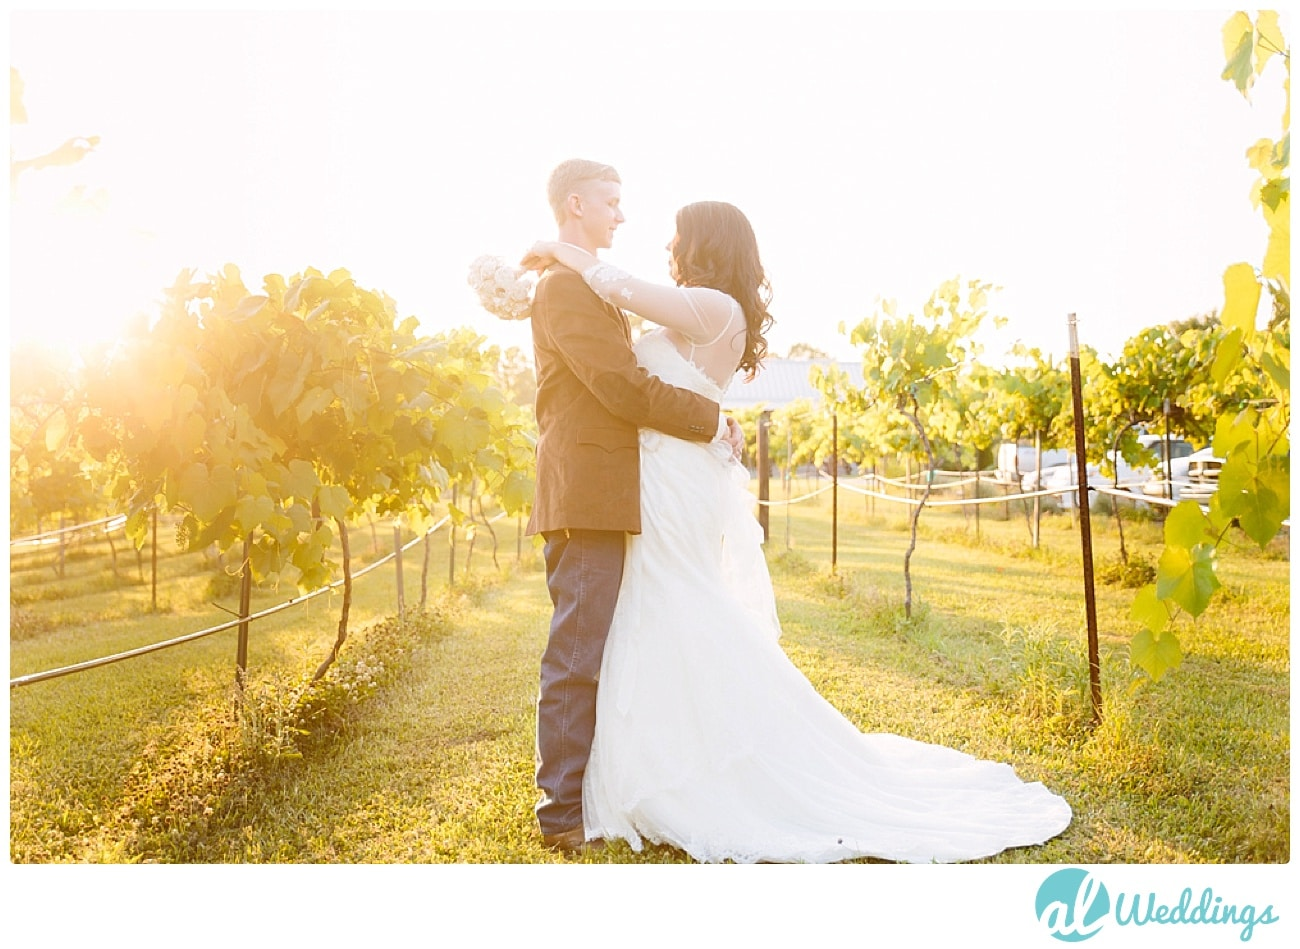 Austin Wedding | Hidden Meadows Vineyard | Alabama Wedding Photographer-56.jpg